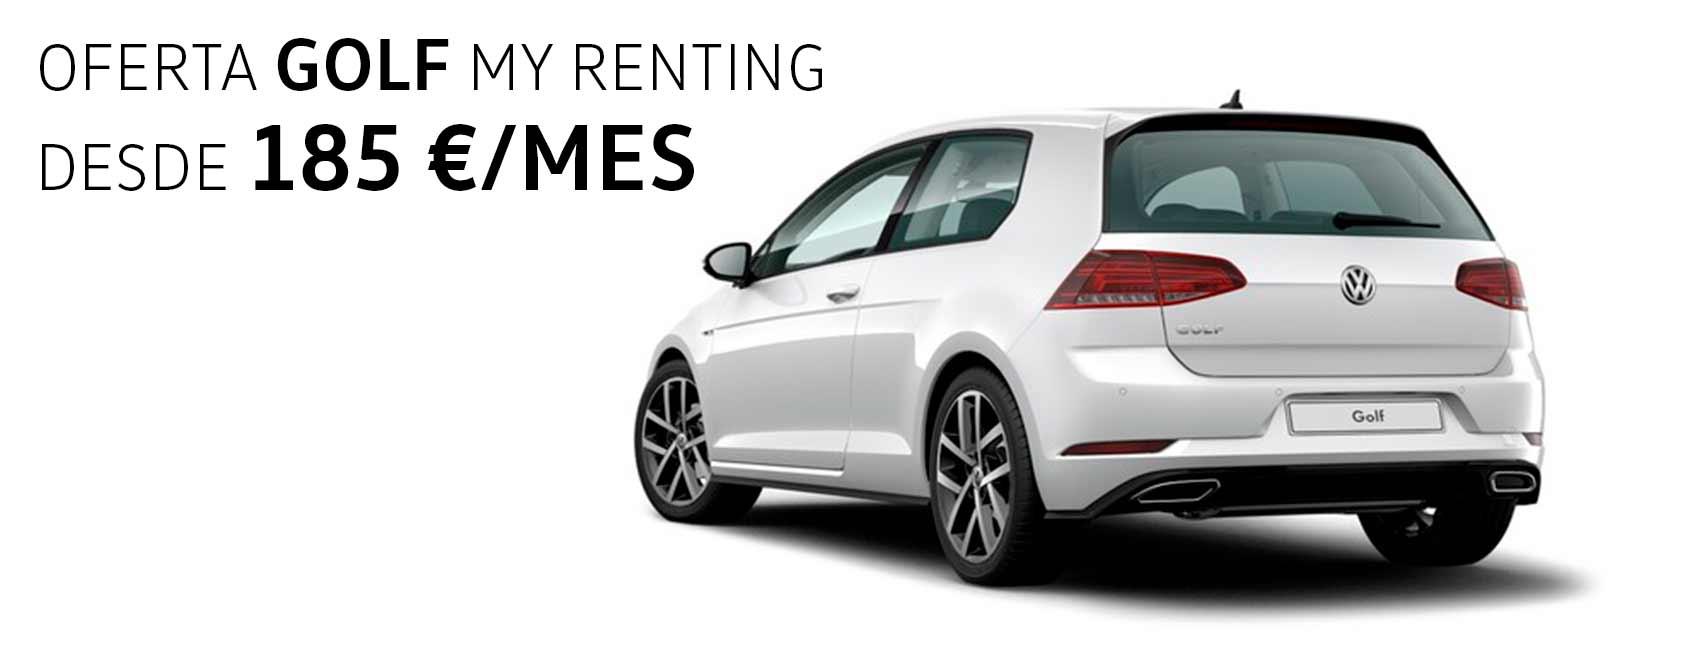 Volkswagen renting Zaragoza Golf